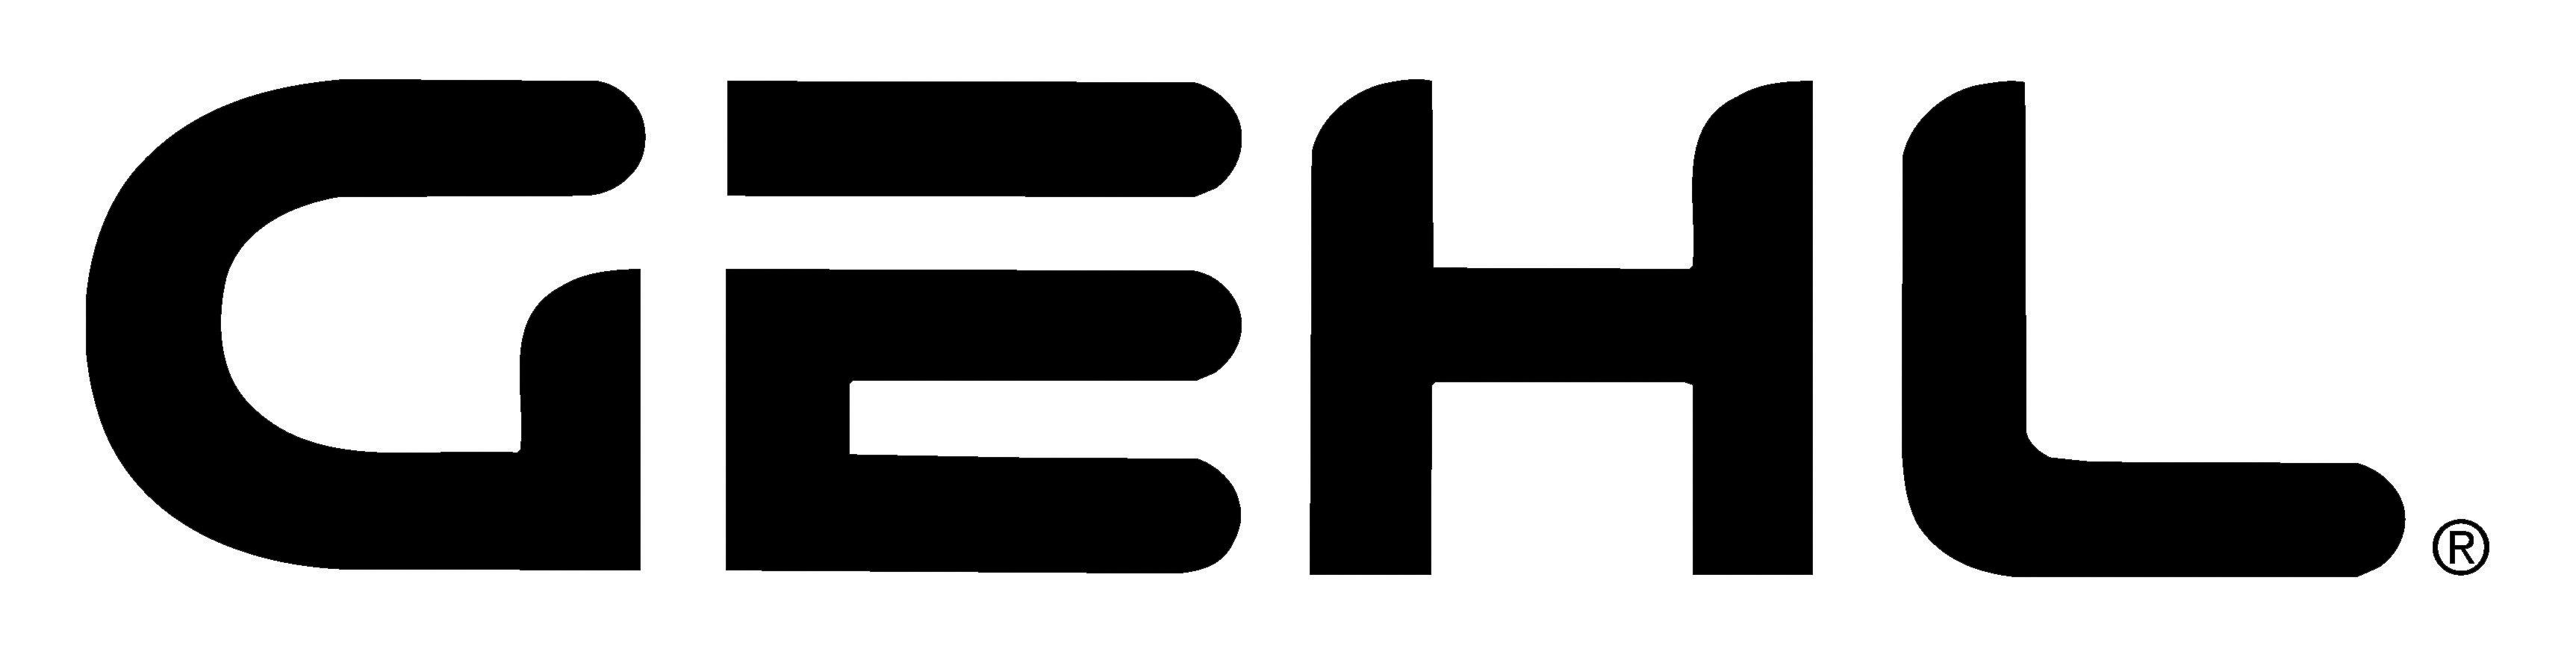 gehl-logo Vente d'équipement